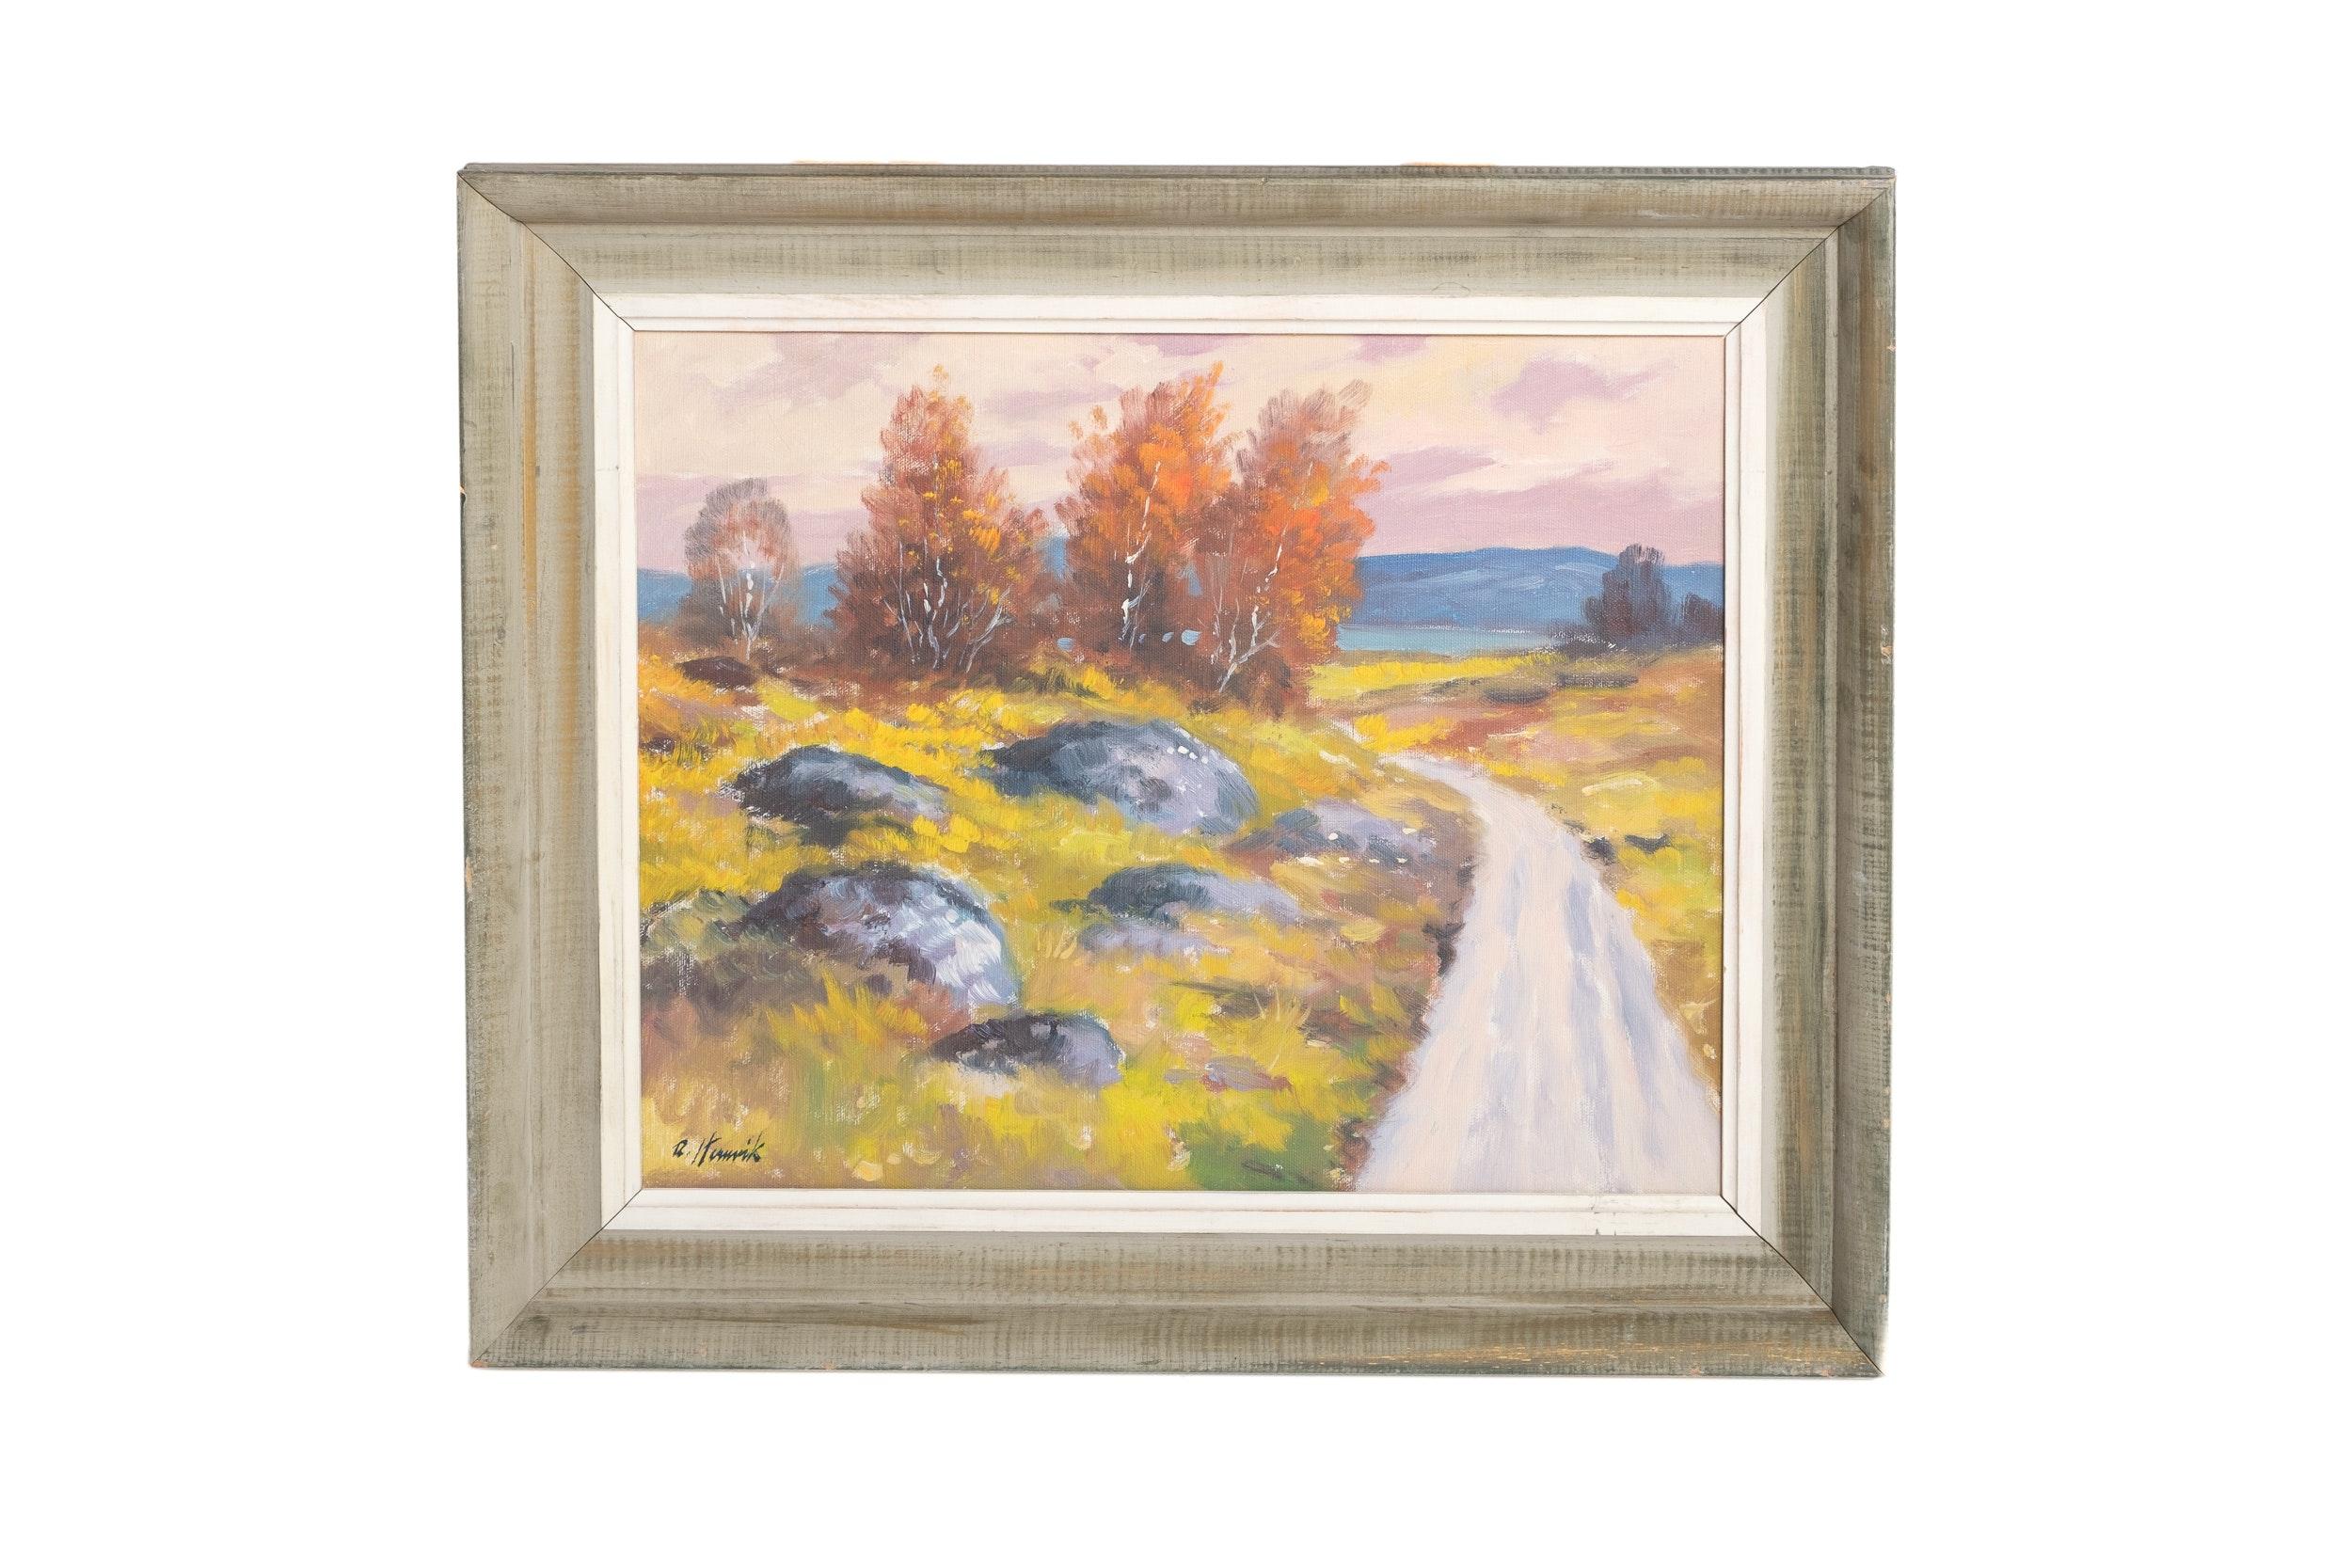 R. Hemirk Landscape Oil on Canvas